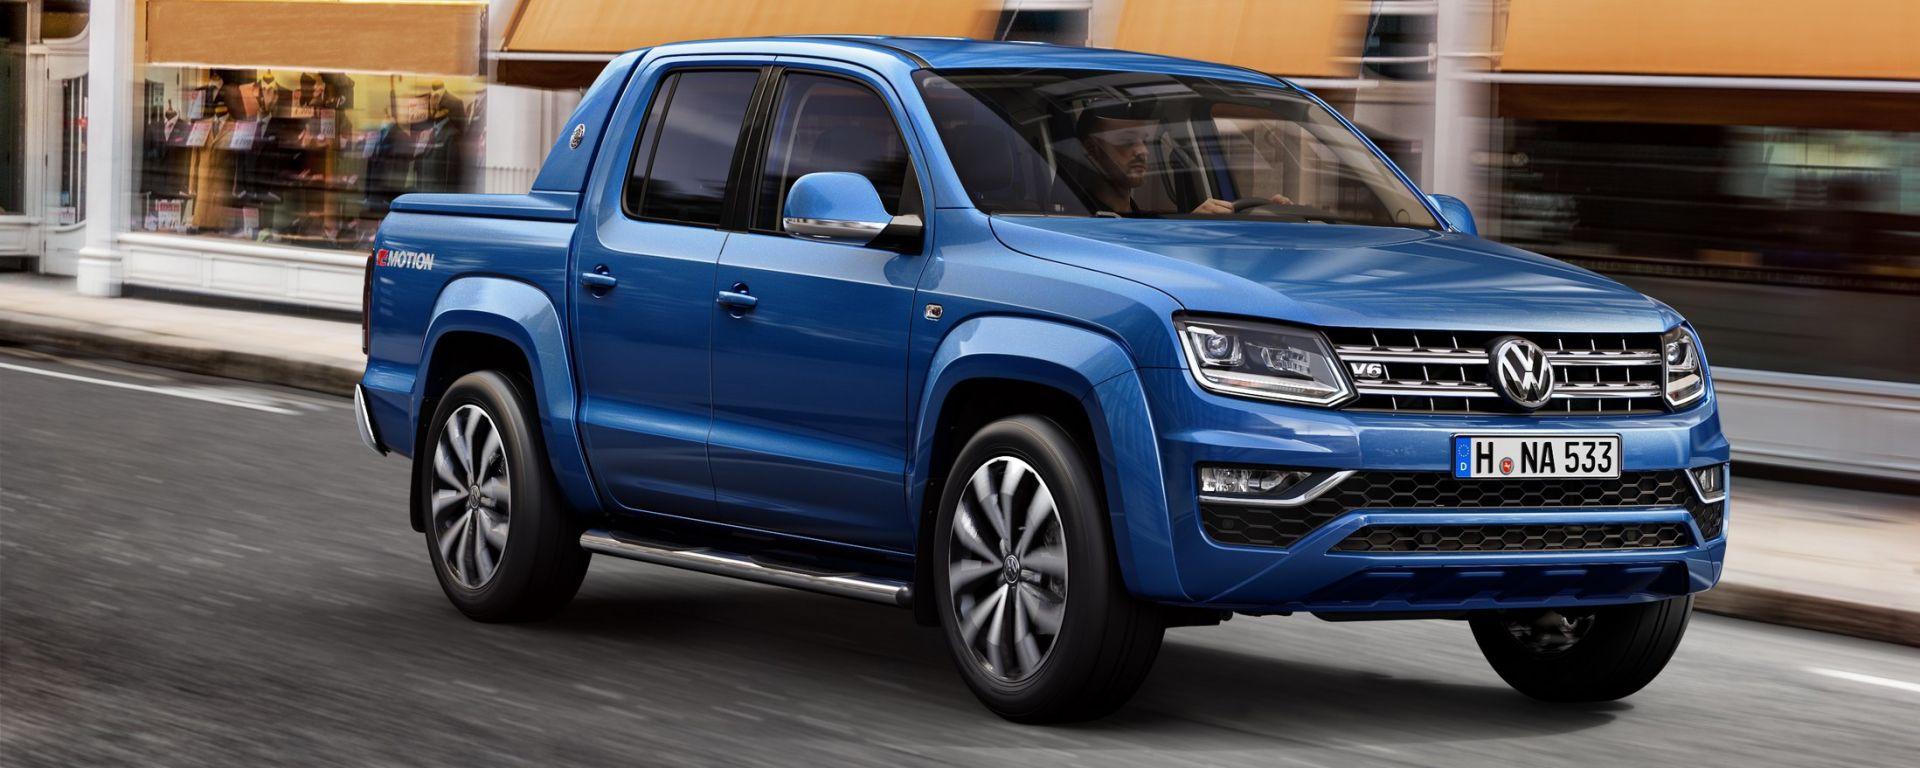 Volkswagen Amarok Aventura V6: nuovo look e motori 3.0 TDI